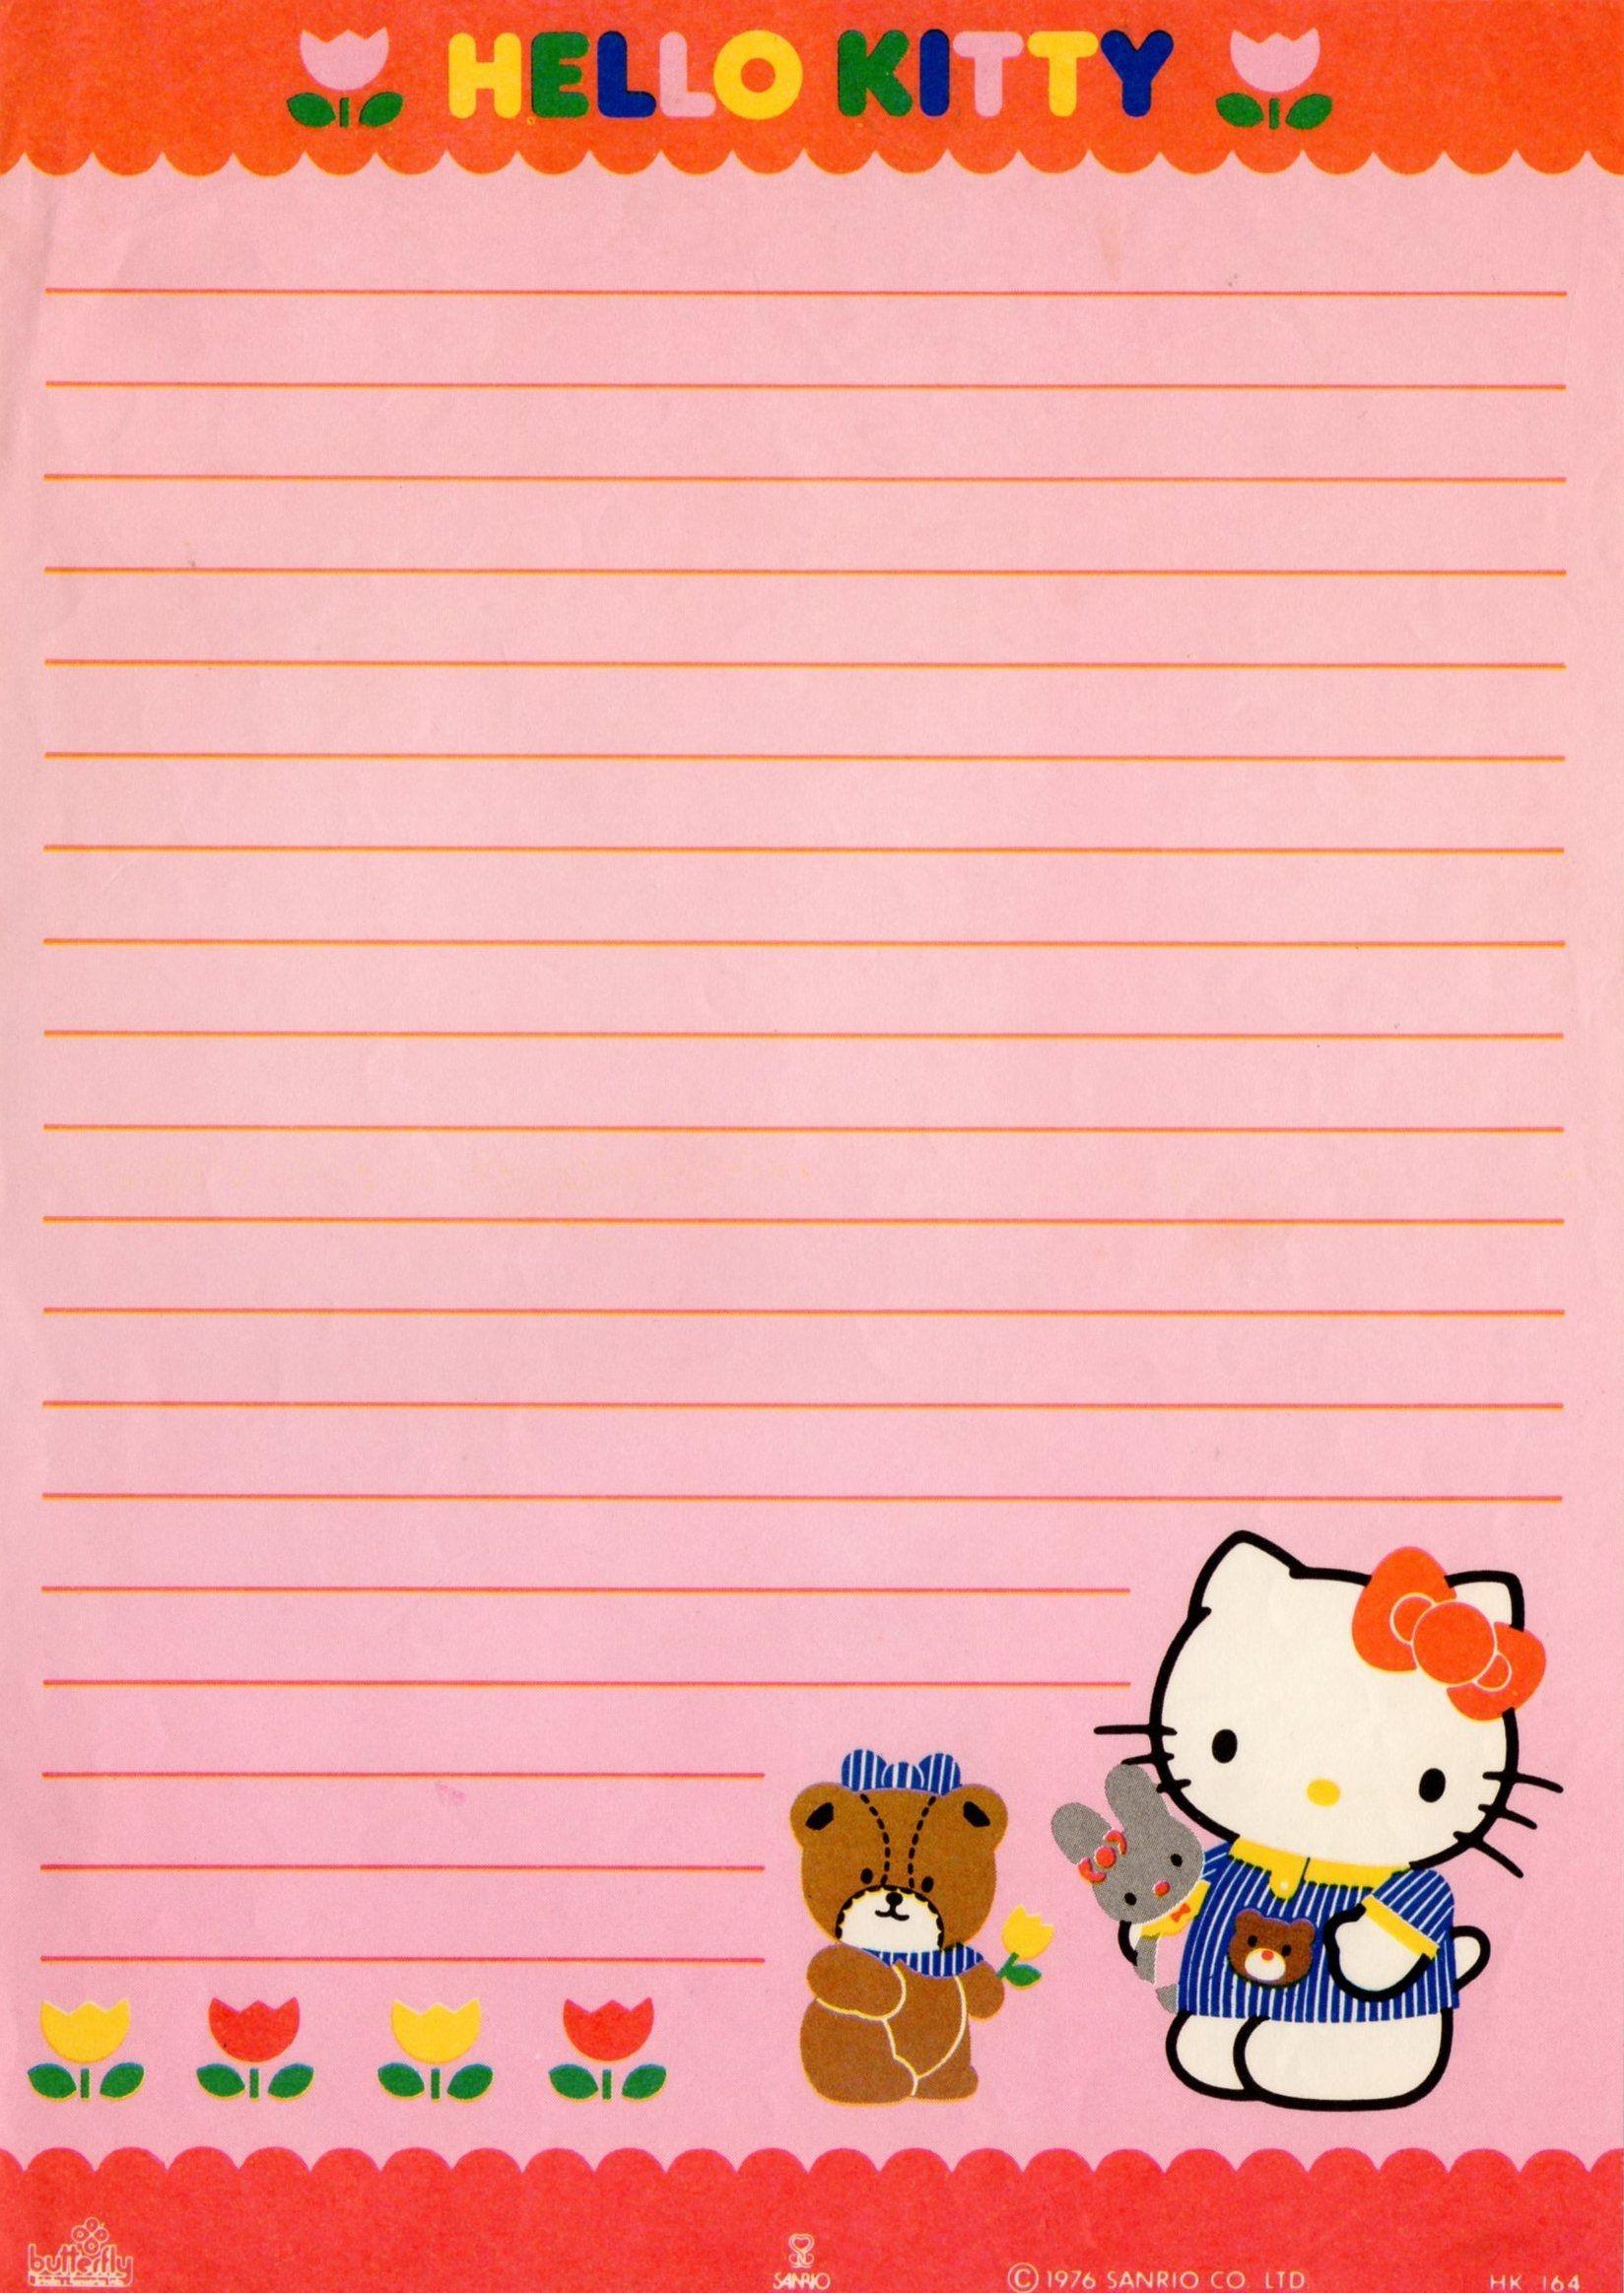 Hello Kitty Vintage Stationery Papel De Carta | Writing Paper - Free Printable Hello Kitty Stationery